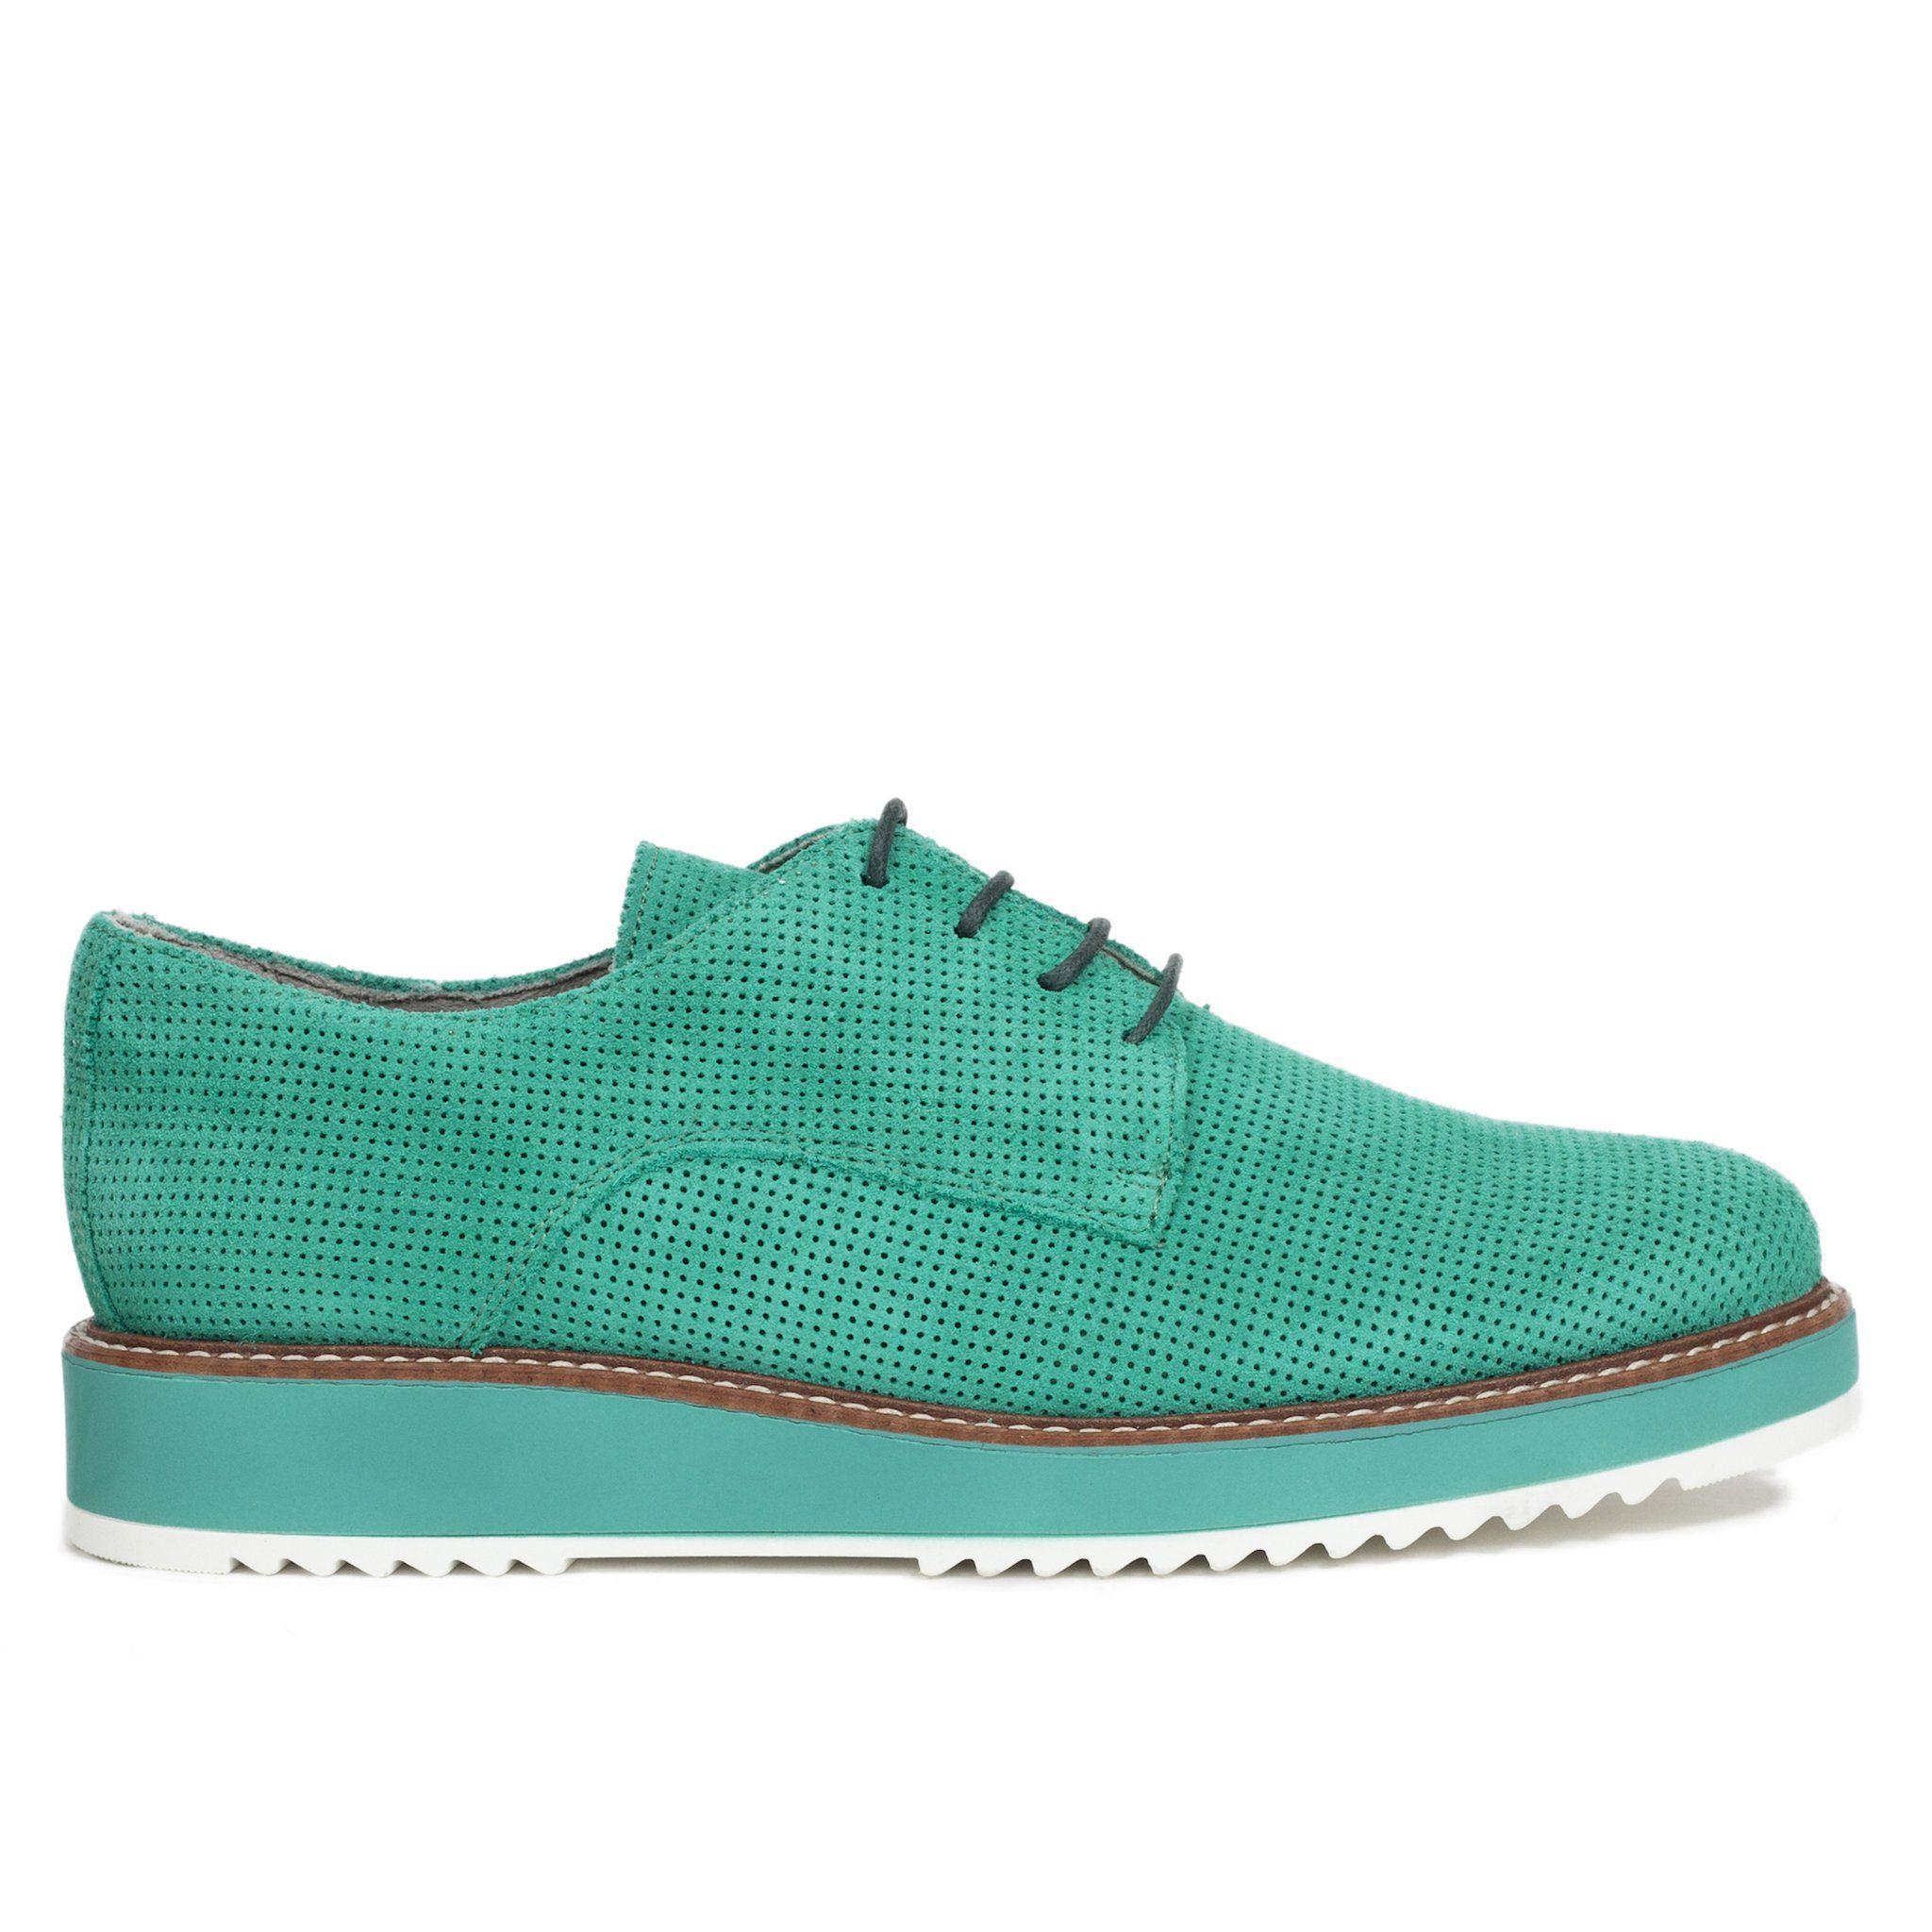 zapatos verde zapatos verde online agua n60Spw4qS